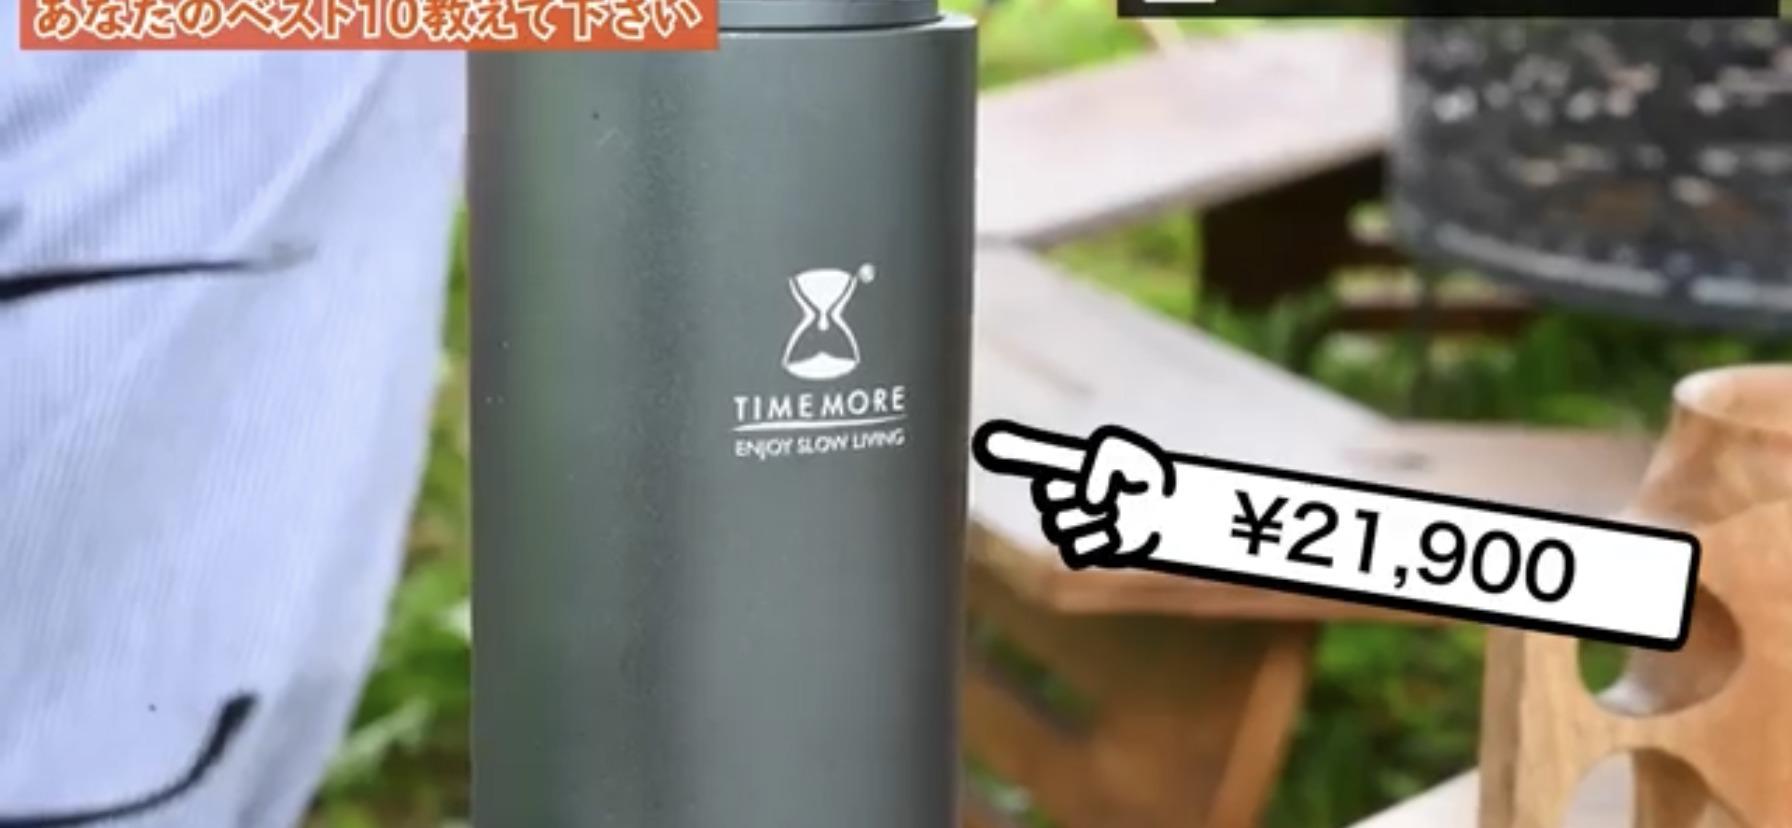 【TIMEMORE】栗G1チタンプロフェッショナルグレード